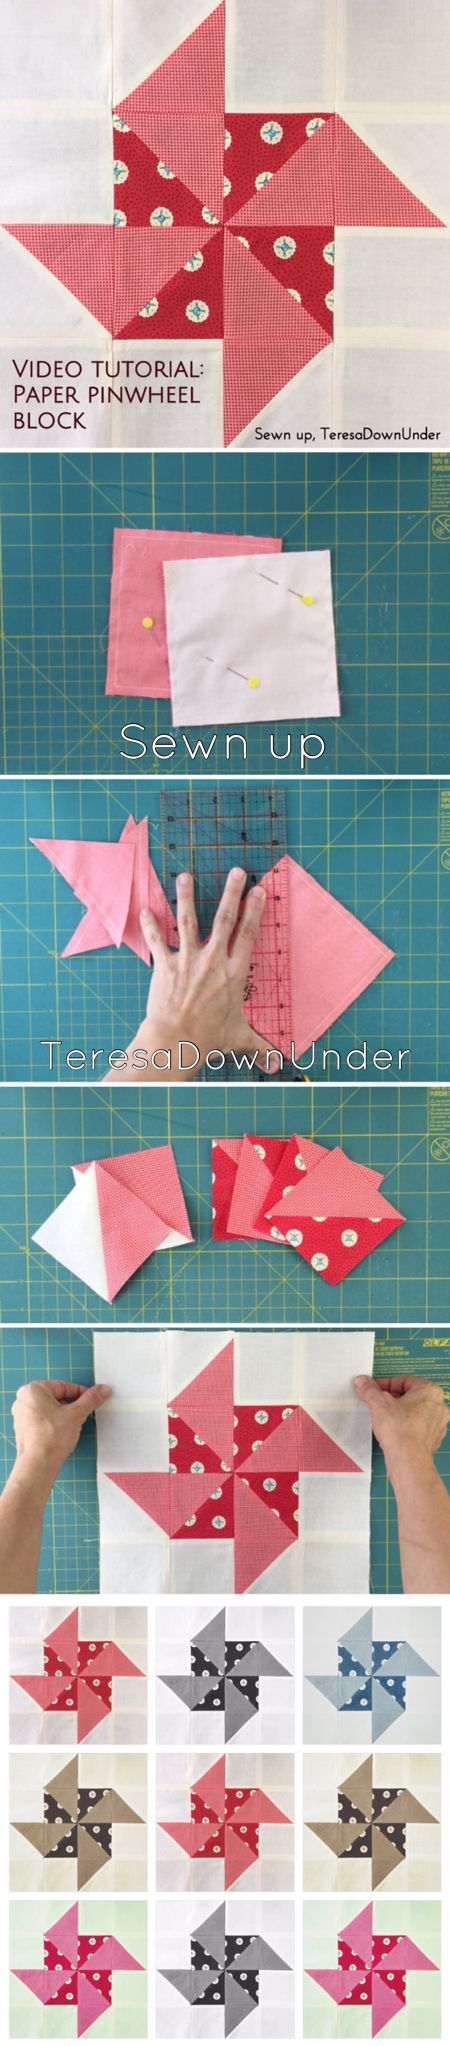 Video tutorial: paper pinwheel quilt block